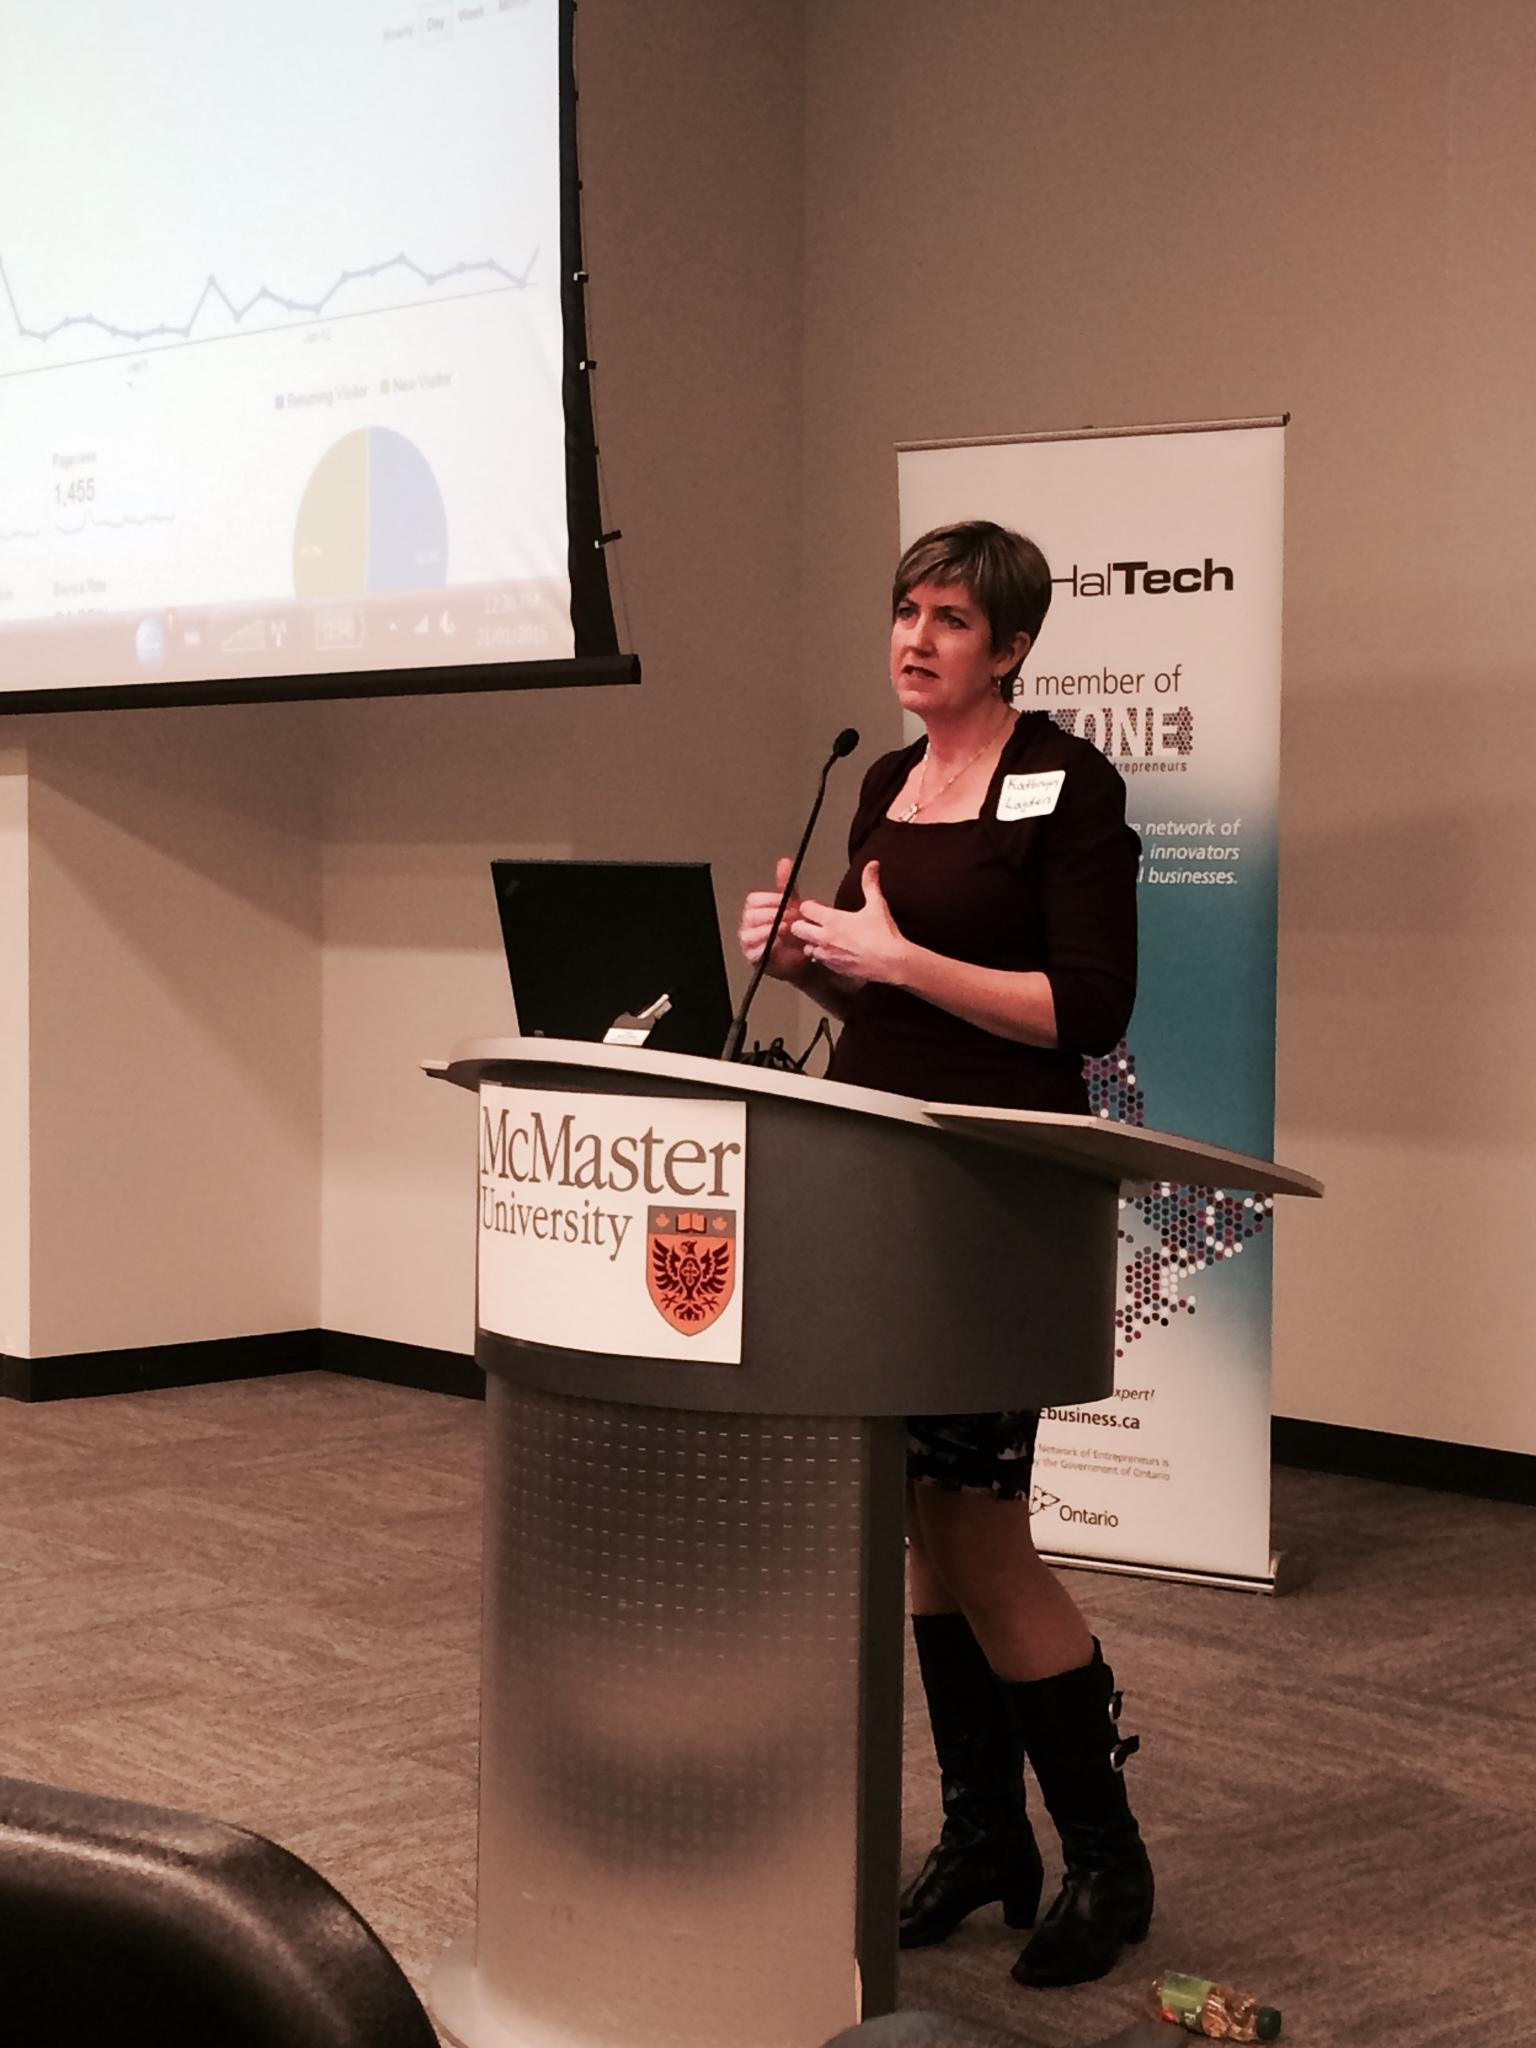 Kathryn Lagden talks about web analytics